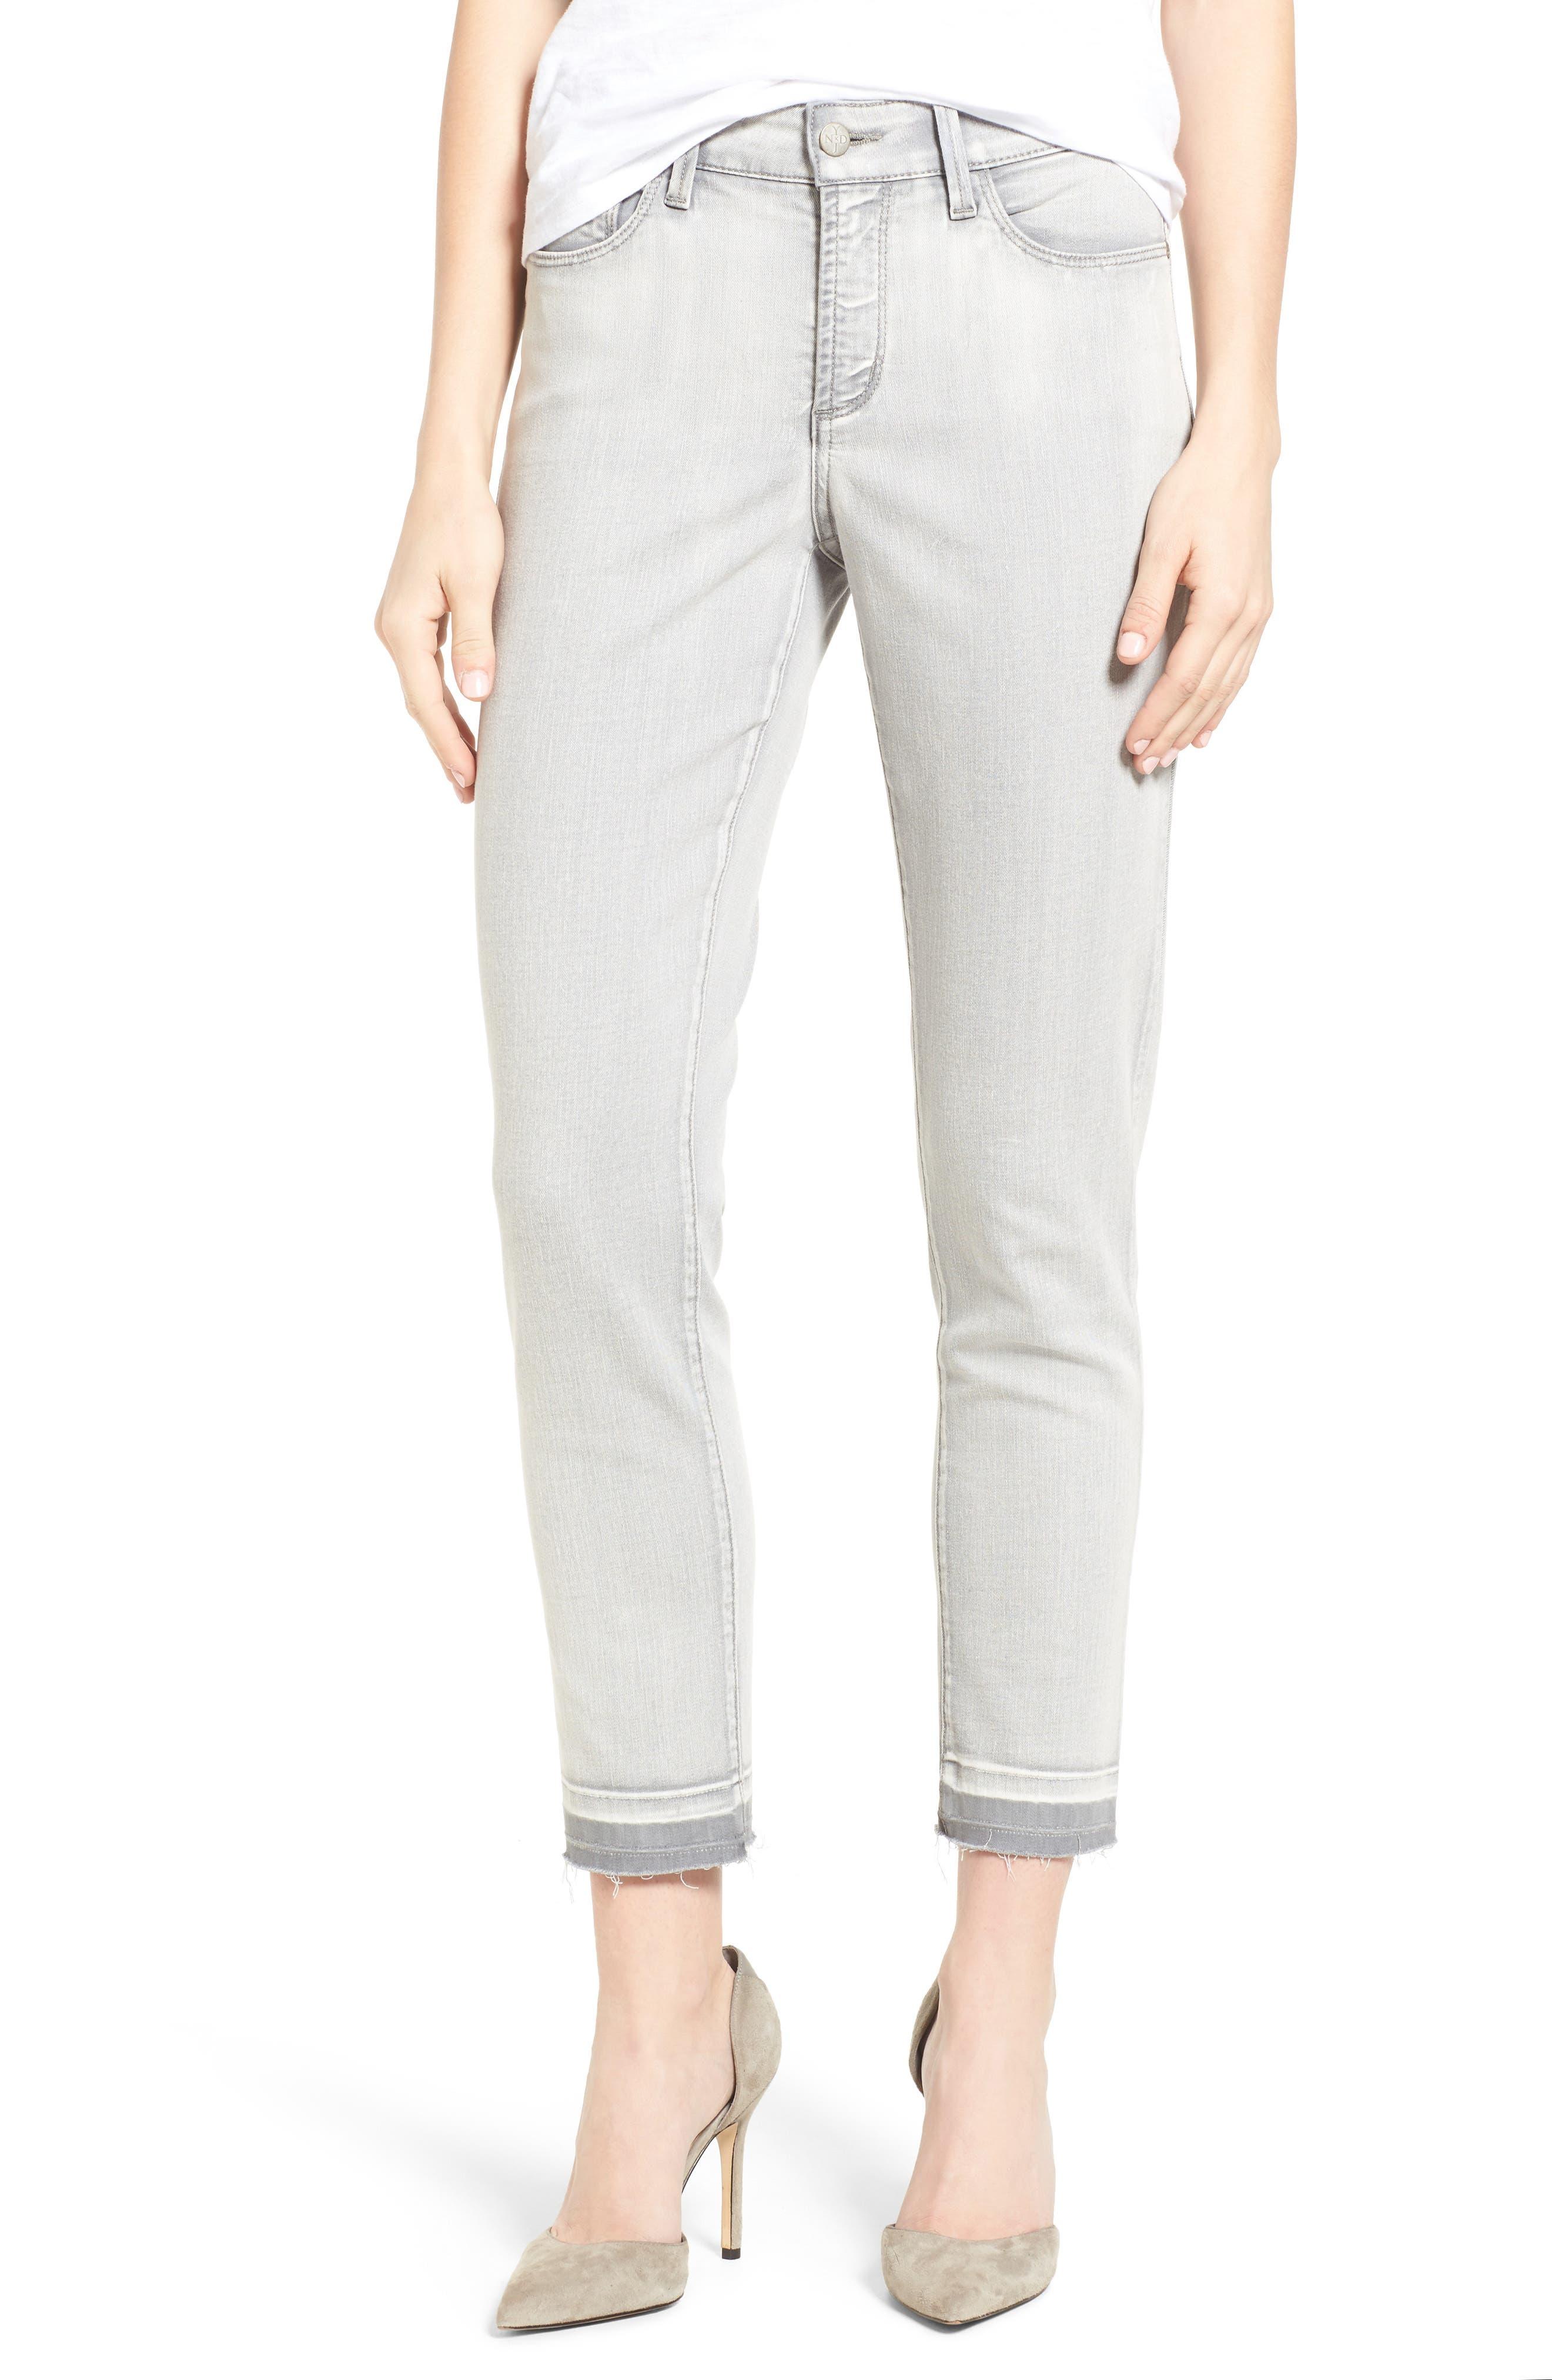 NYDJ Alina Release Hem Stretch Ankle Jeans